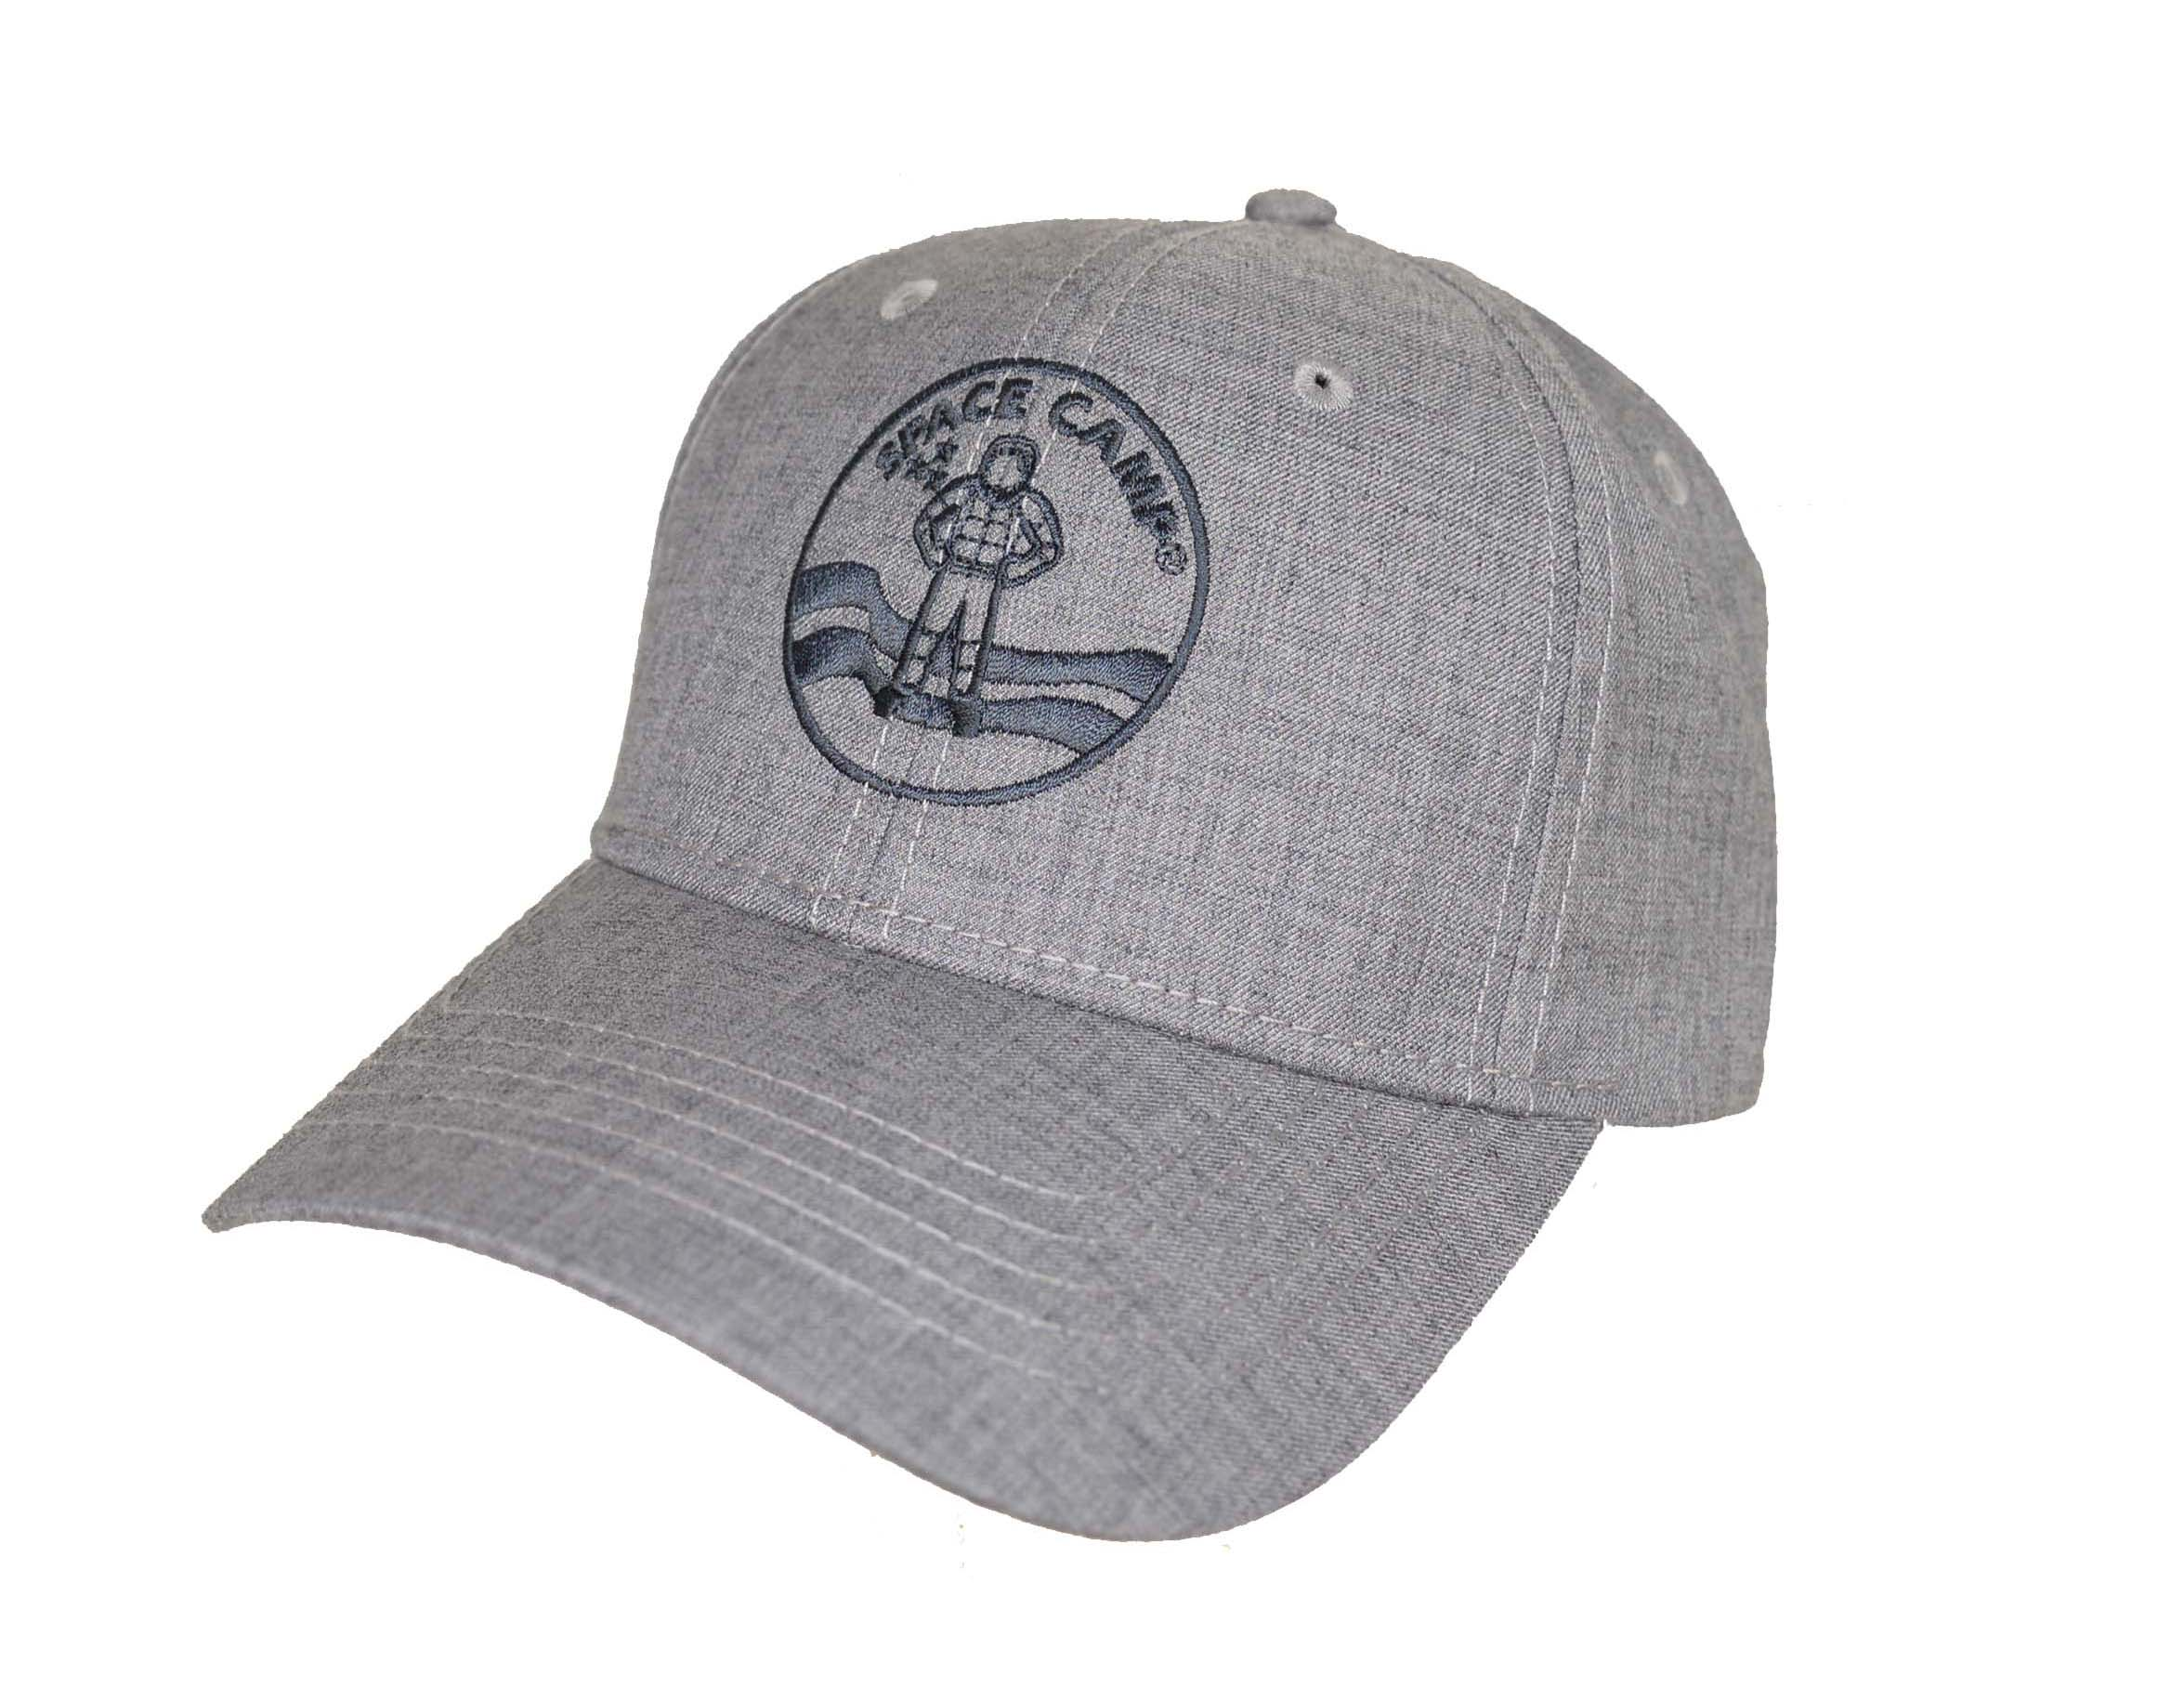 Space Camp Logo Melange Twill Cap,SPACECAMP,S110210/PH182